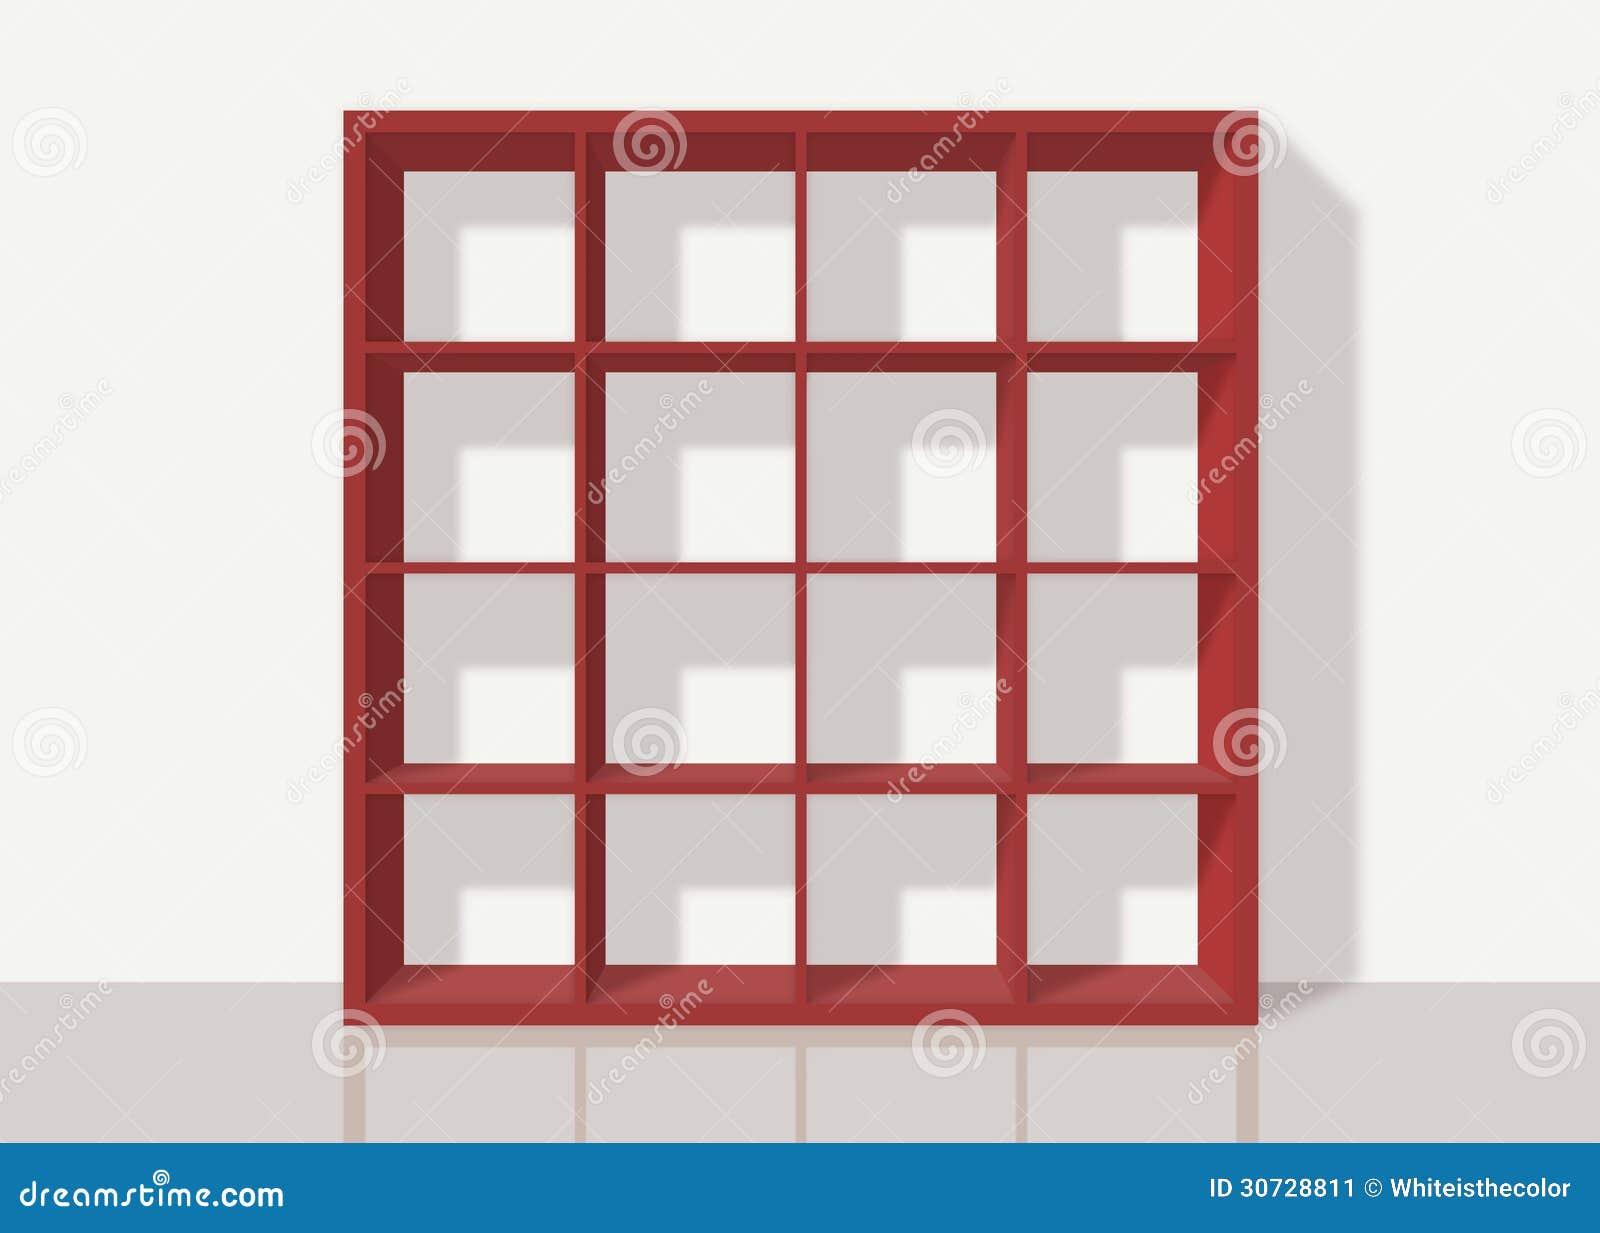 rotes leeres quadratisches b cherregal auf wei em wandhintergrund stockbild bild 30728811. Black Bedroom Furniture Sets. Home Design Ideas